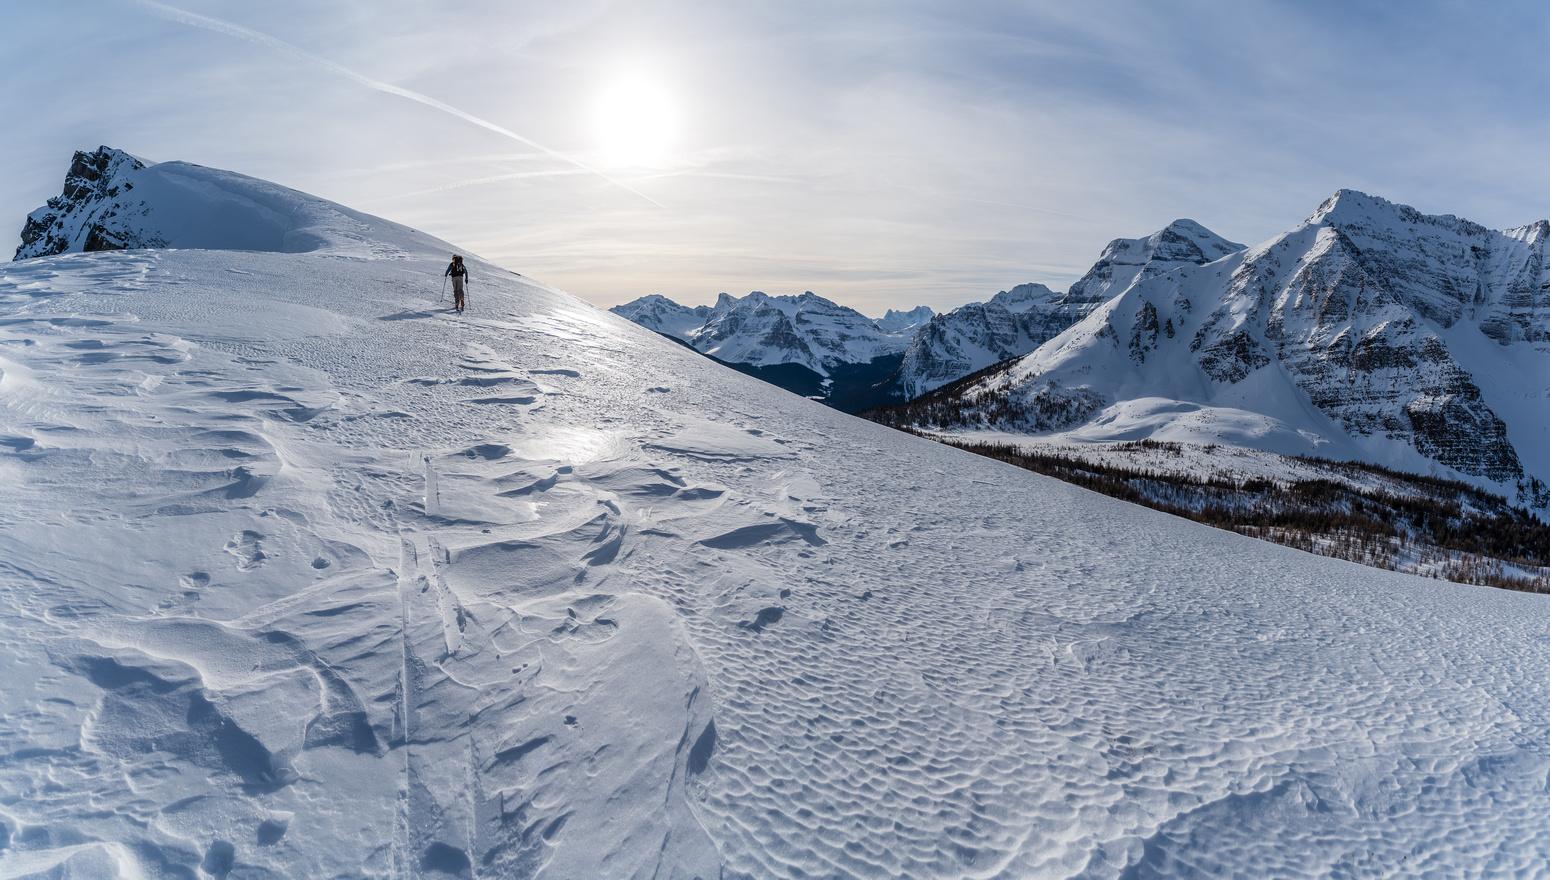 Skinning up the north ridge on hard snow.